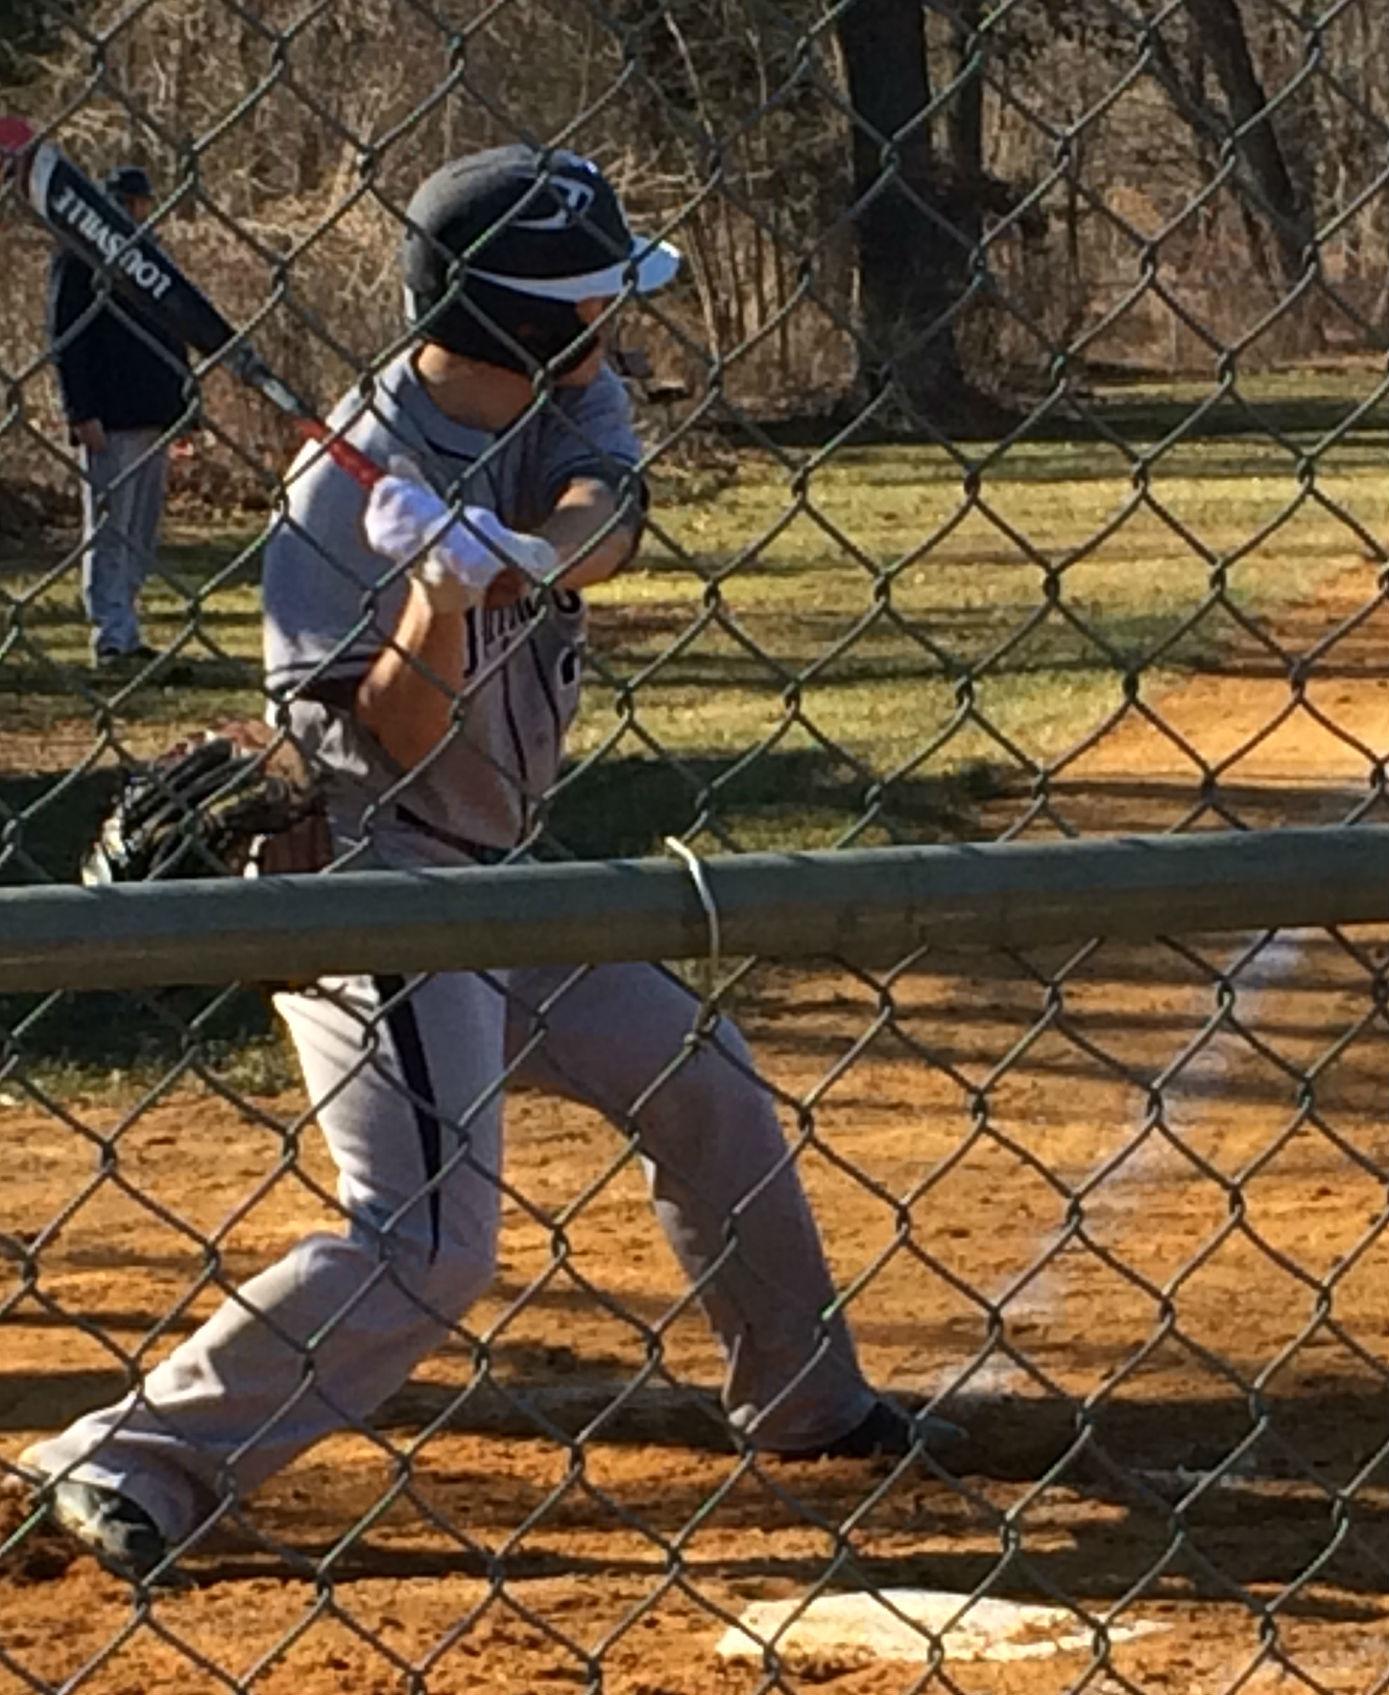 9ebb05f8884229686609_ALJ-Dayton_Baseball_B.jpg